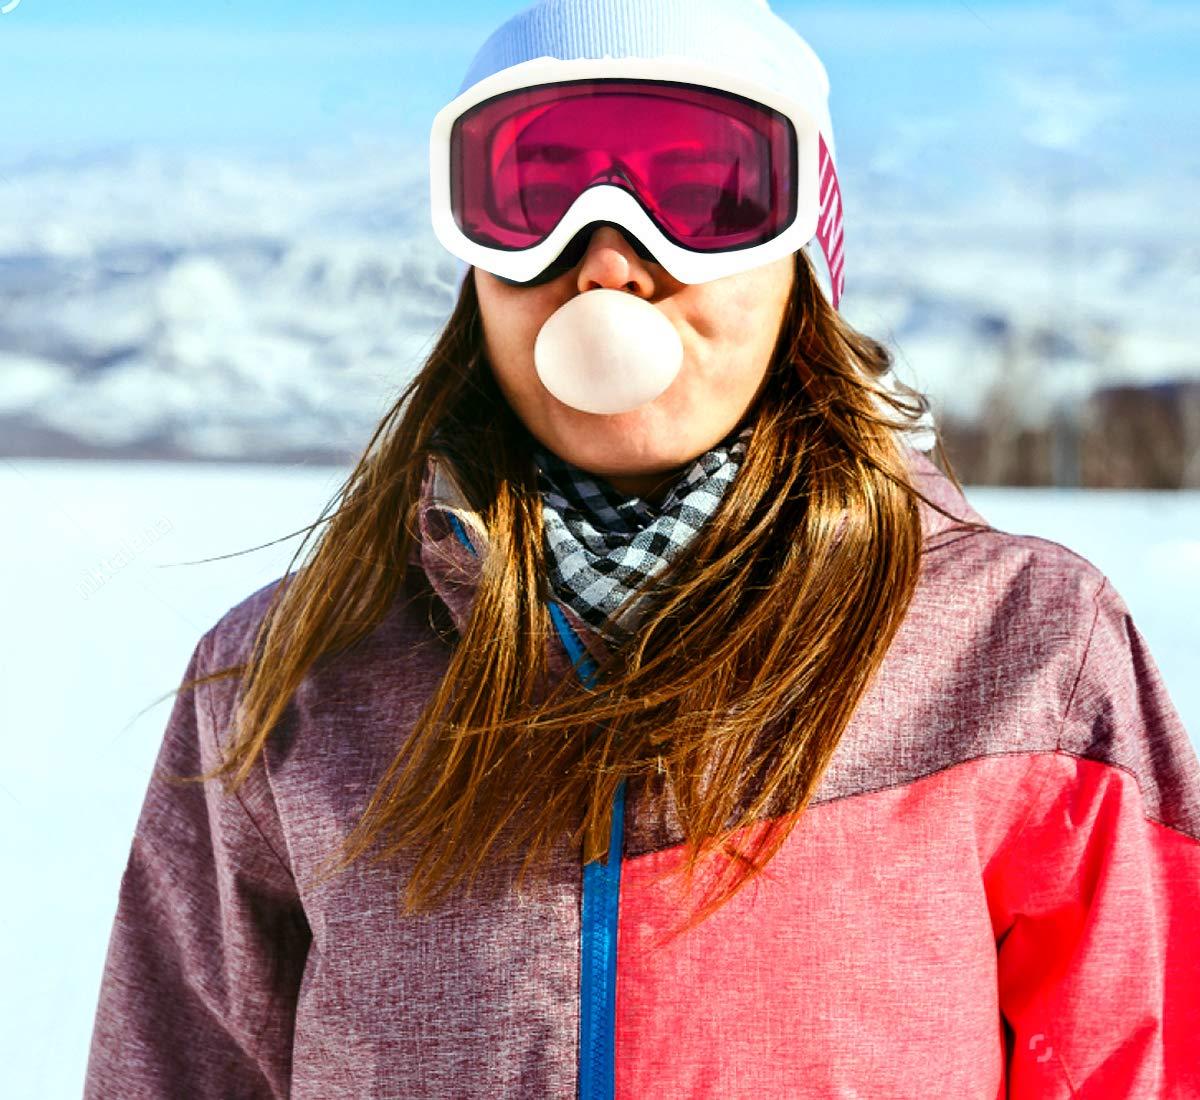 100/% UV Protection Women /& Youth 100/% UV Protection Unigear Skido X1 Ski Goggles VLT 12/% Women /& Youth Revo Blue Lens Anti-Fog Snowboard Goggles for Men